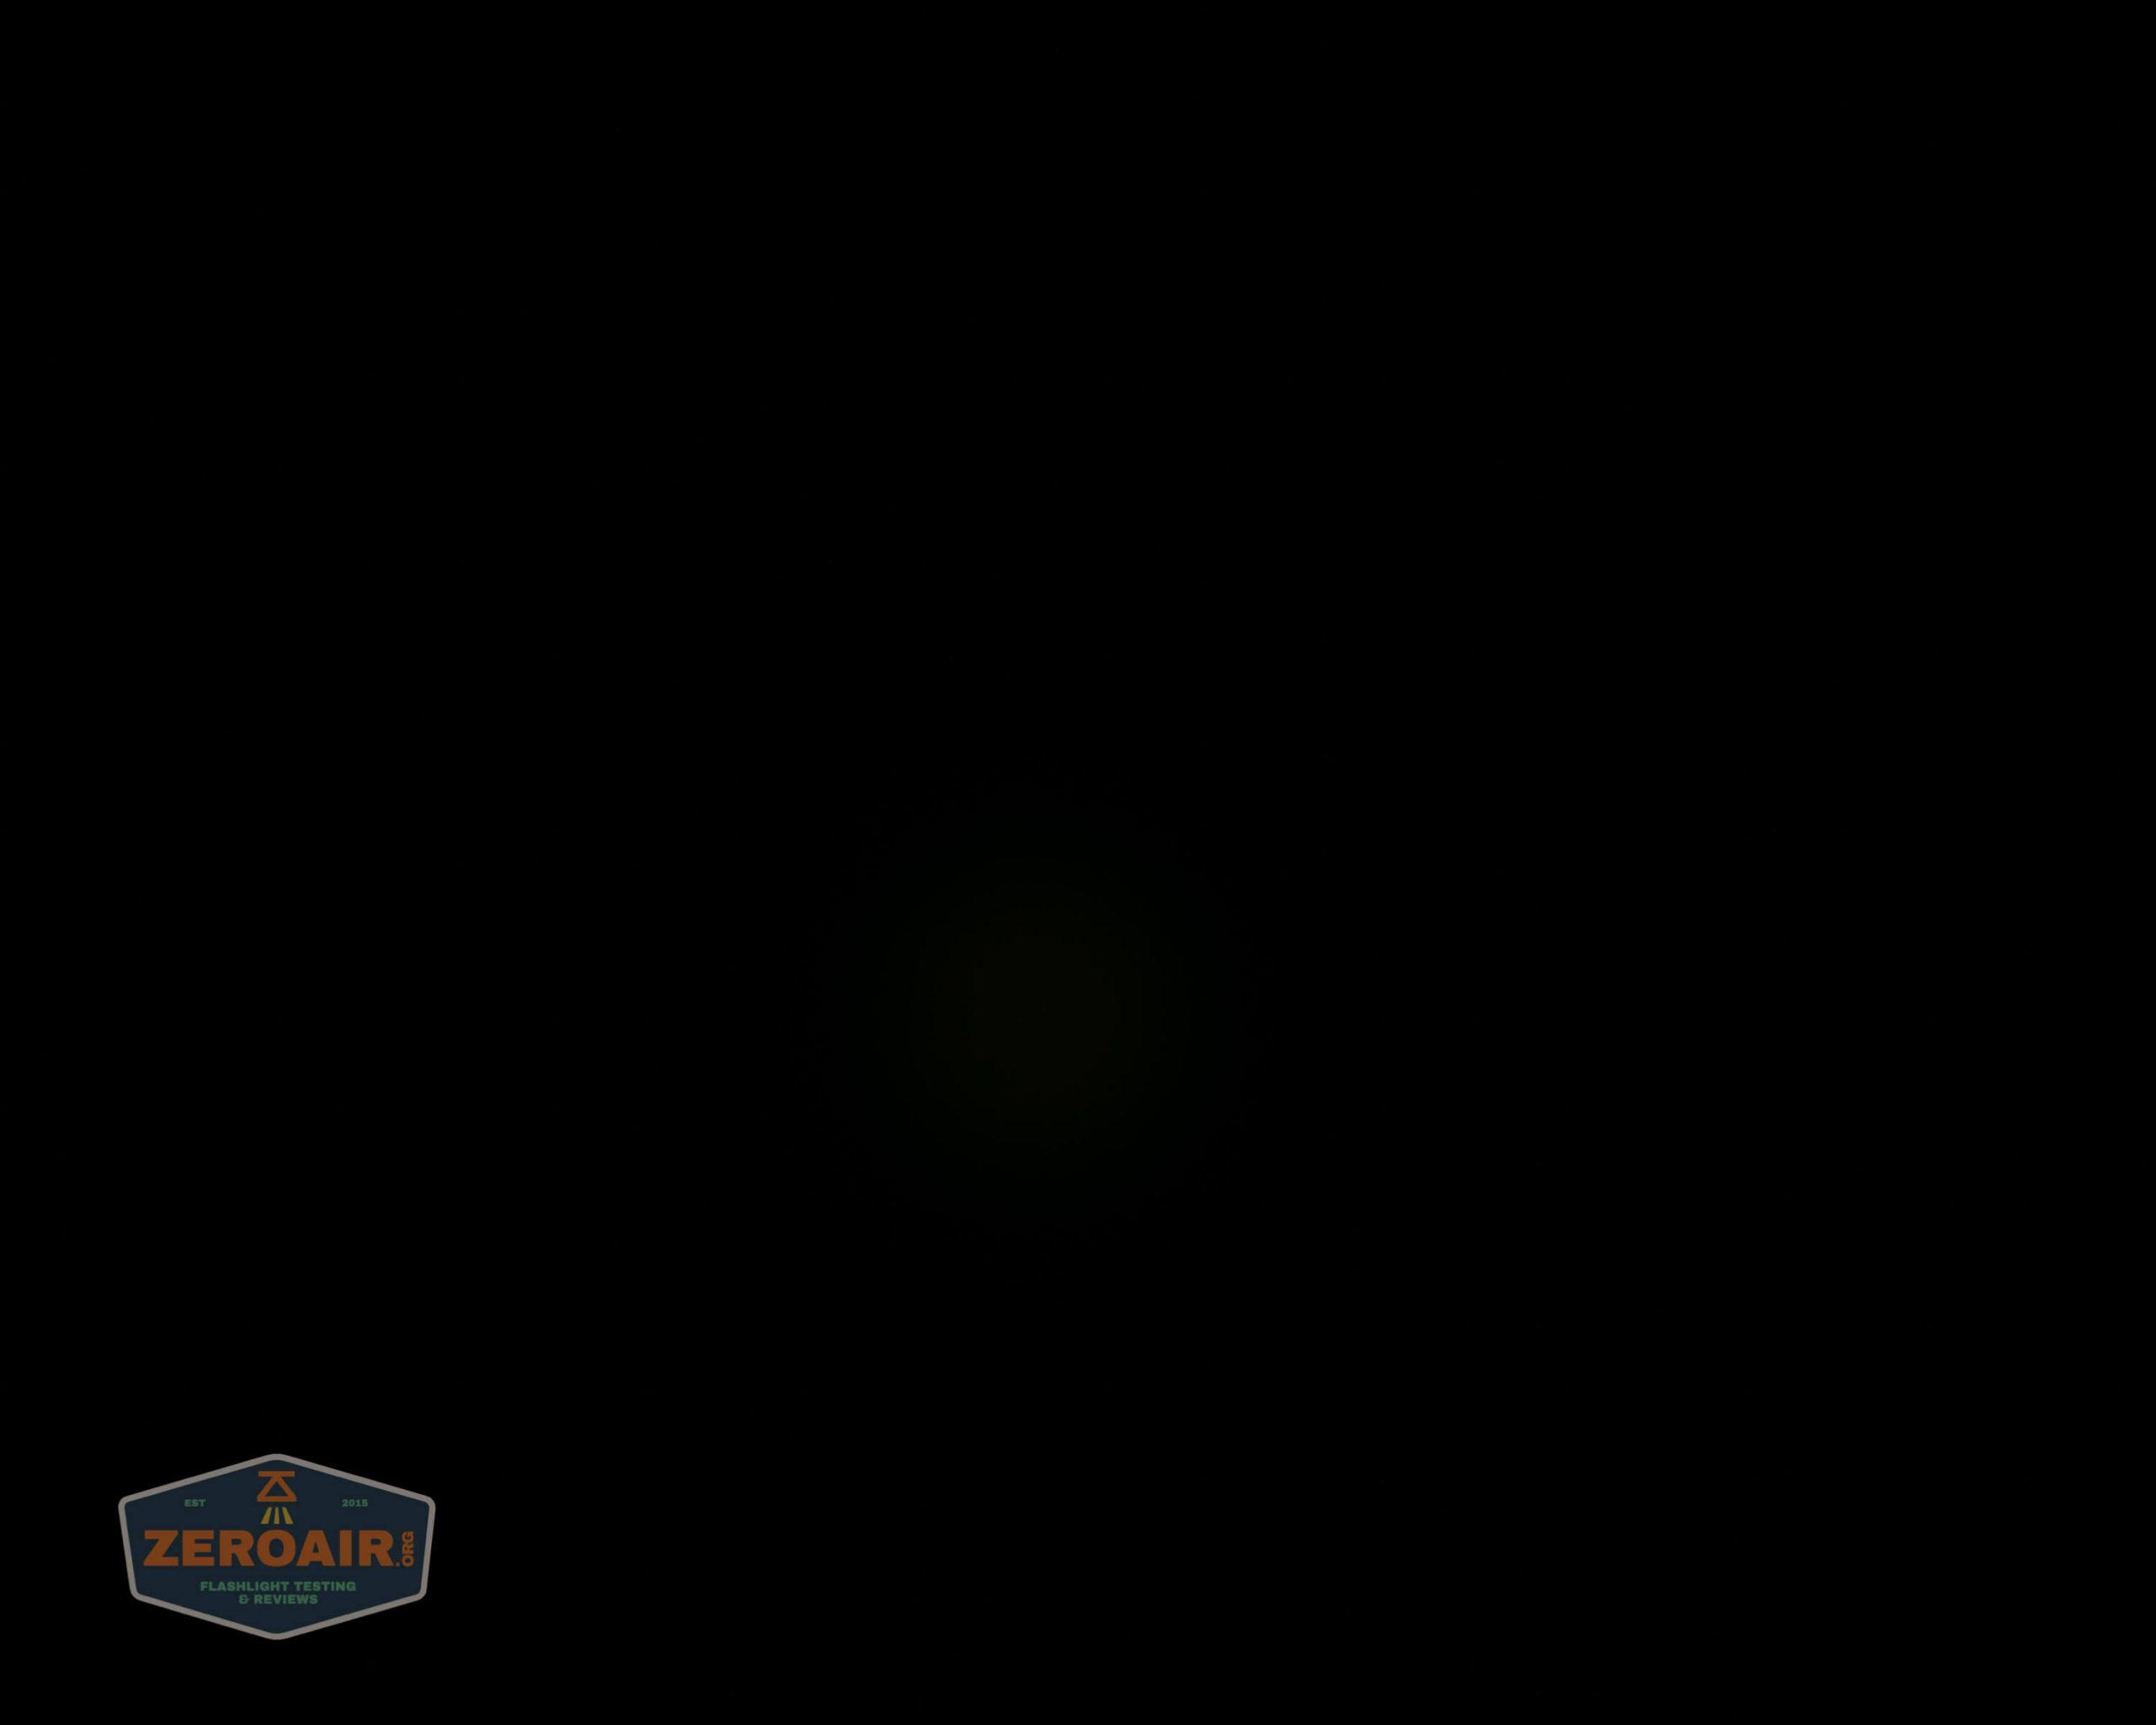 convoy s2+ sst20 2700K 6x7135 orange peel reflector beamshots ceiling